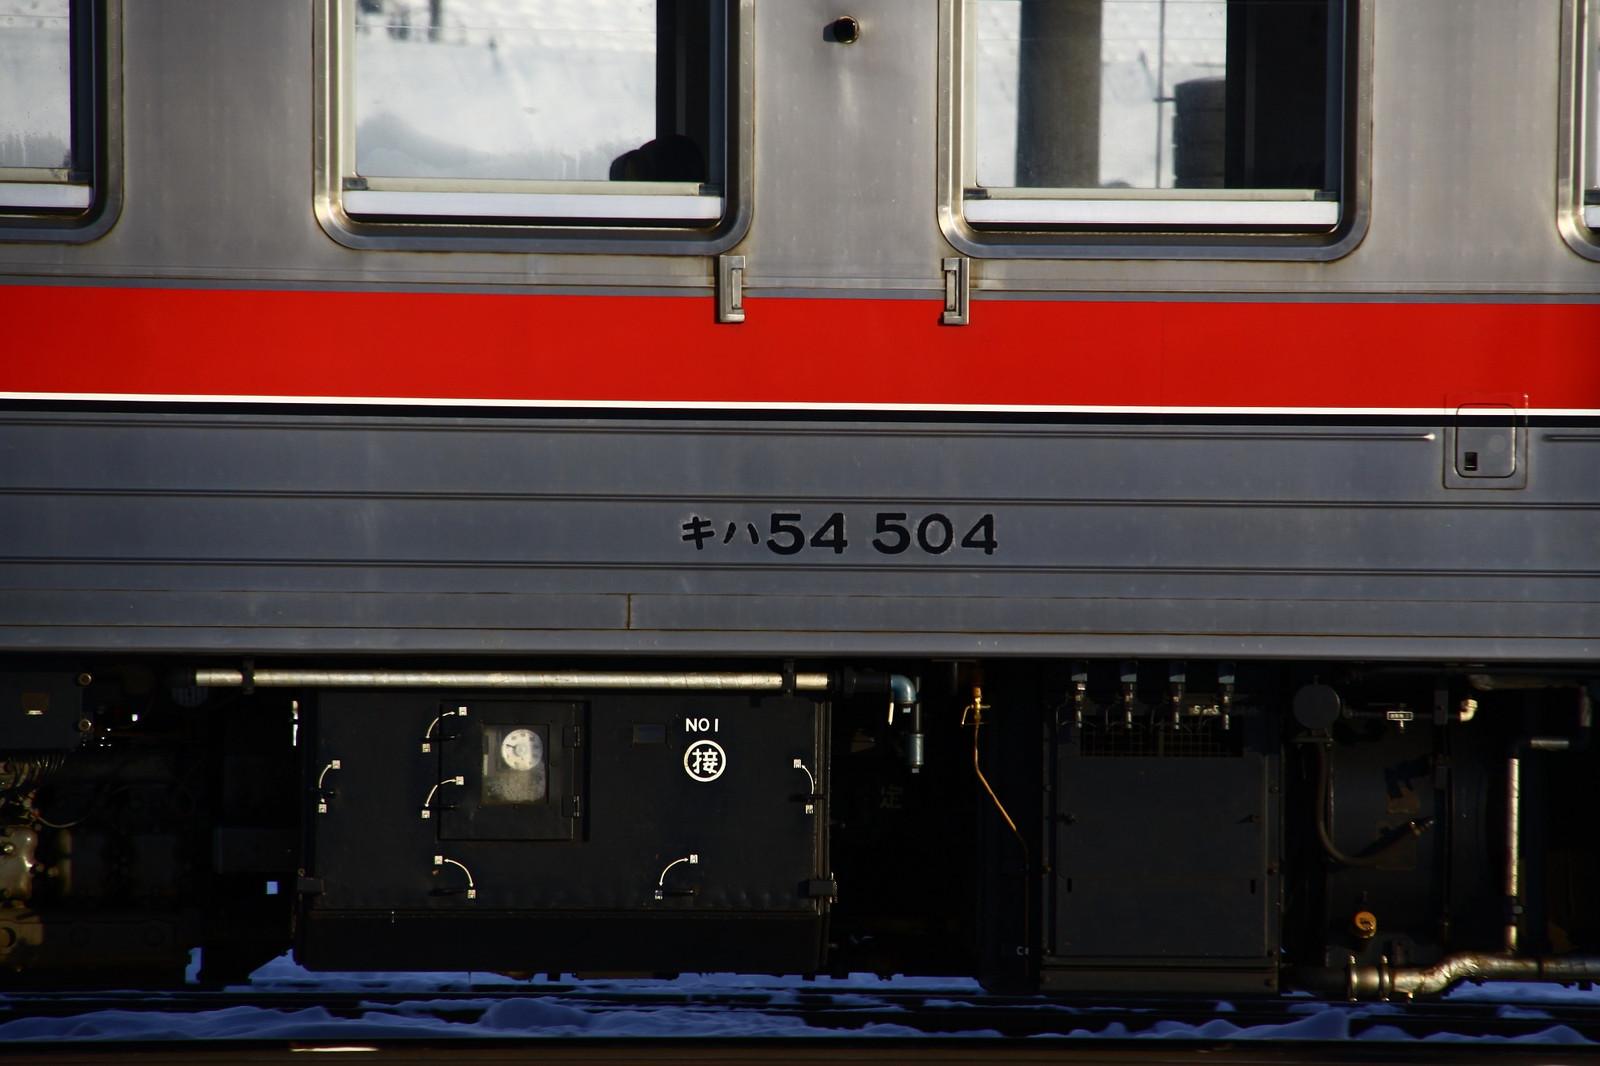 Jr1512291009